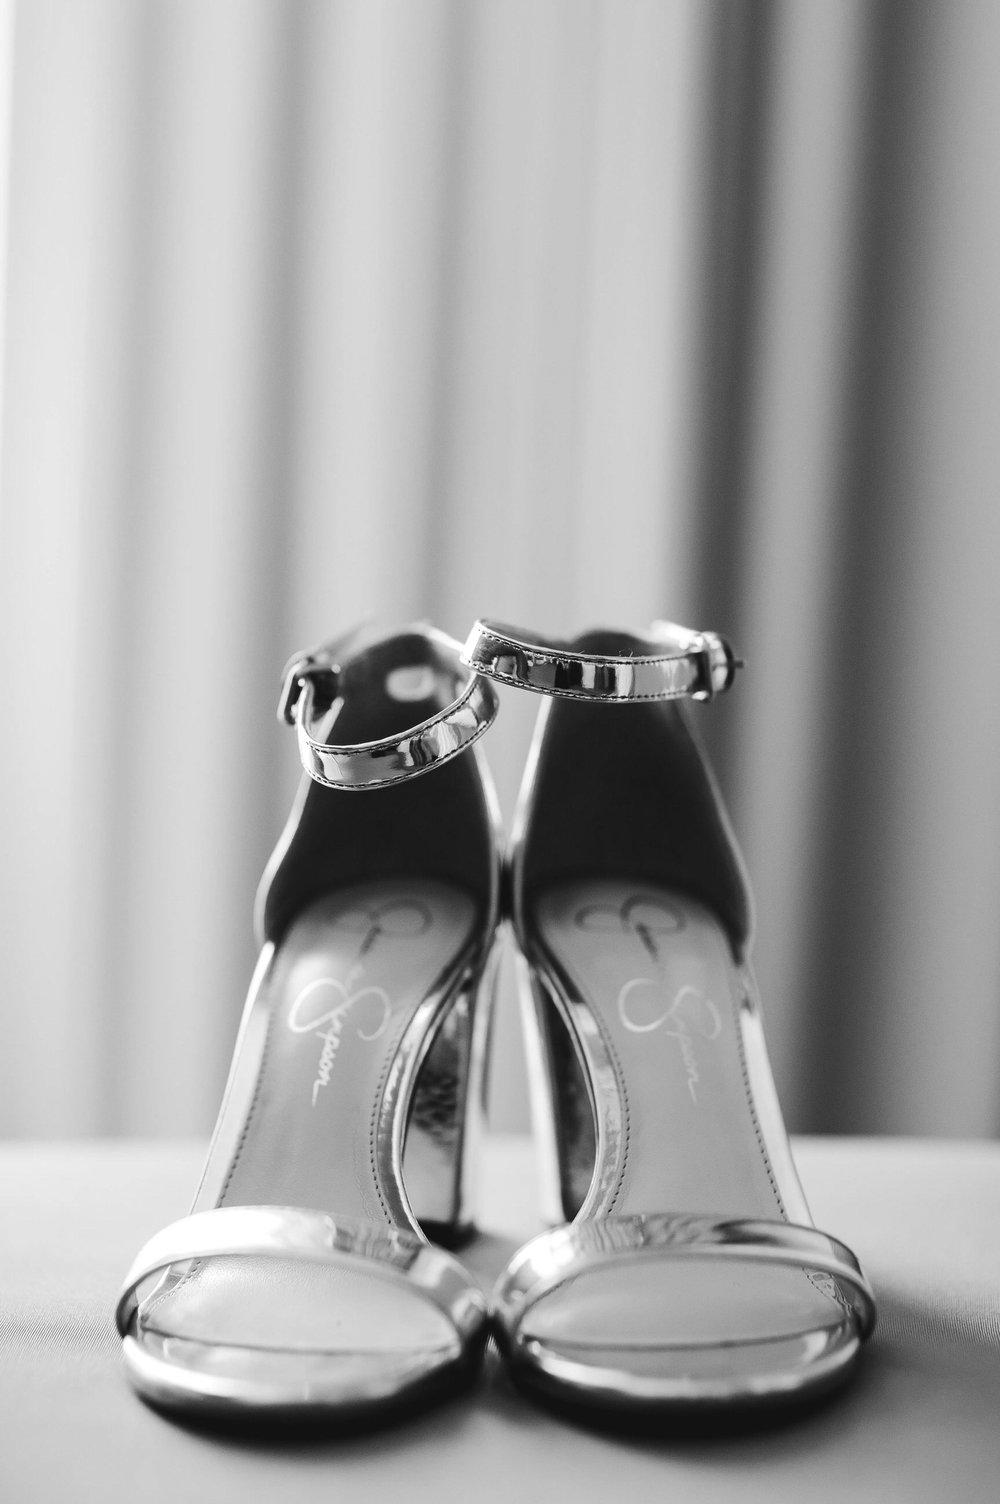 bridal-shoes-details-wedding-destination-wedding-tiny-house-photo.jpg